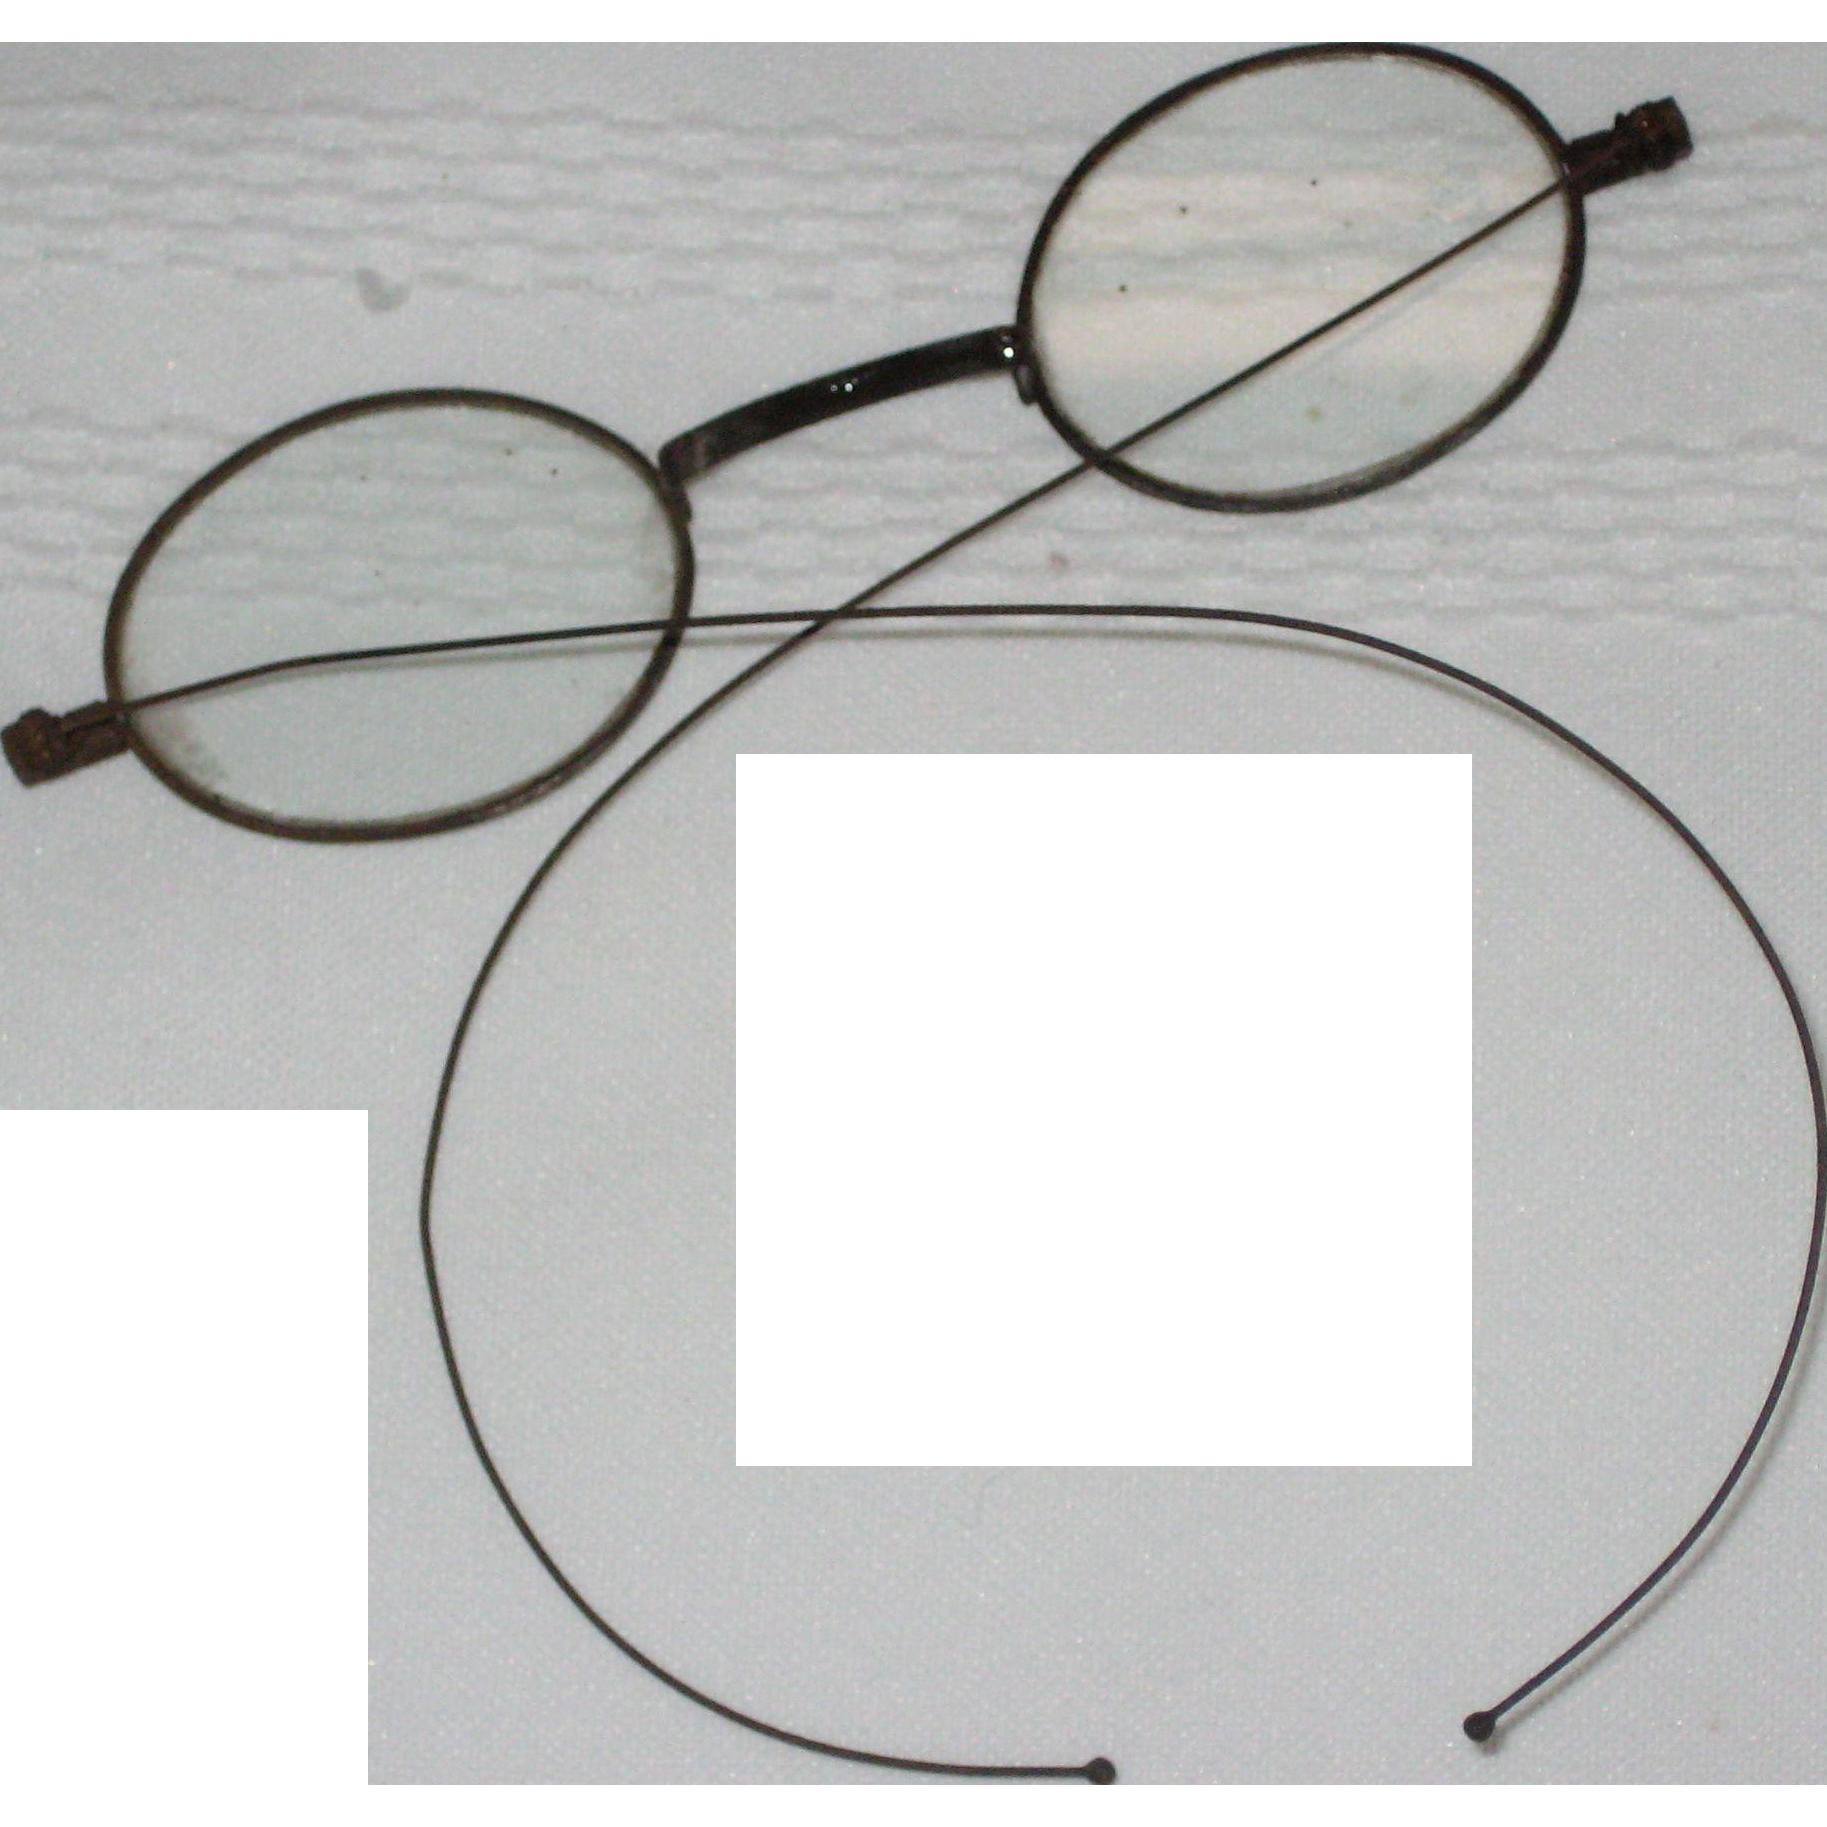 Vintage Wire Rim Eye Glasses or Eyeglasses